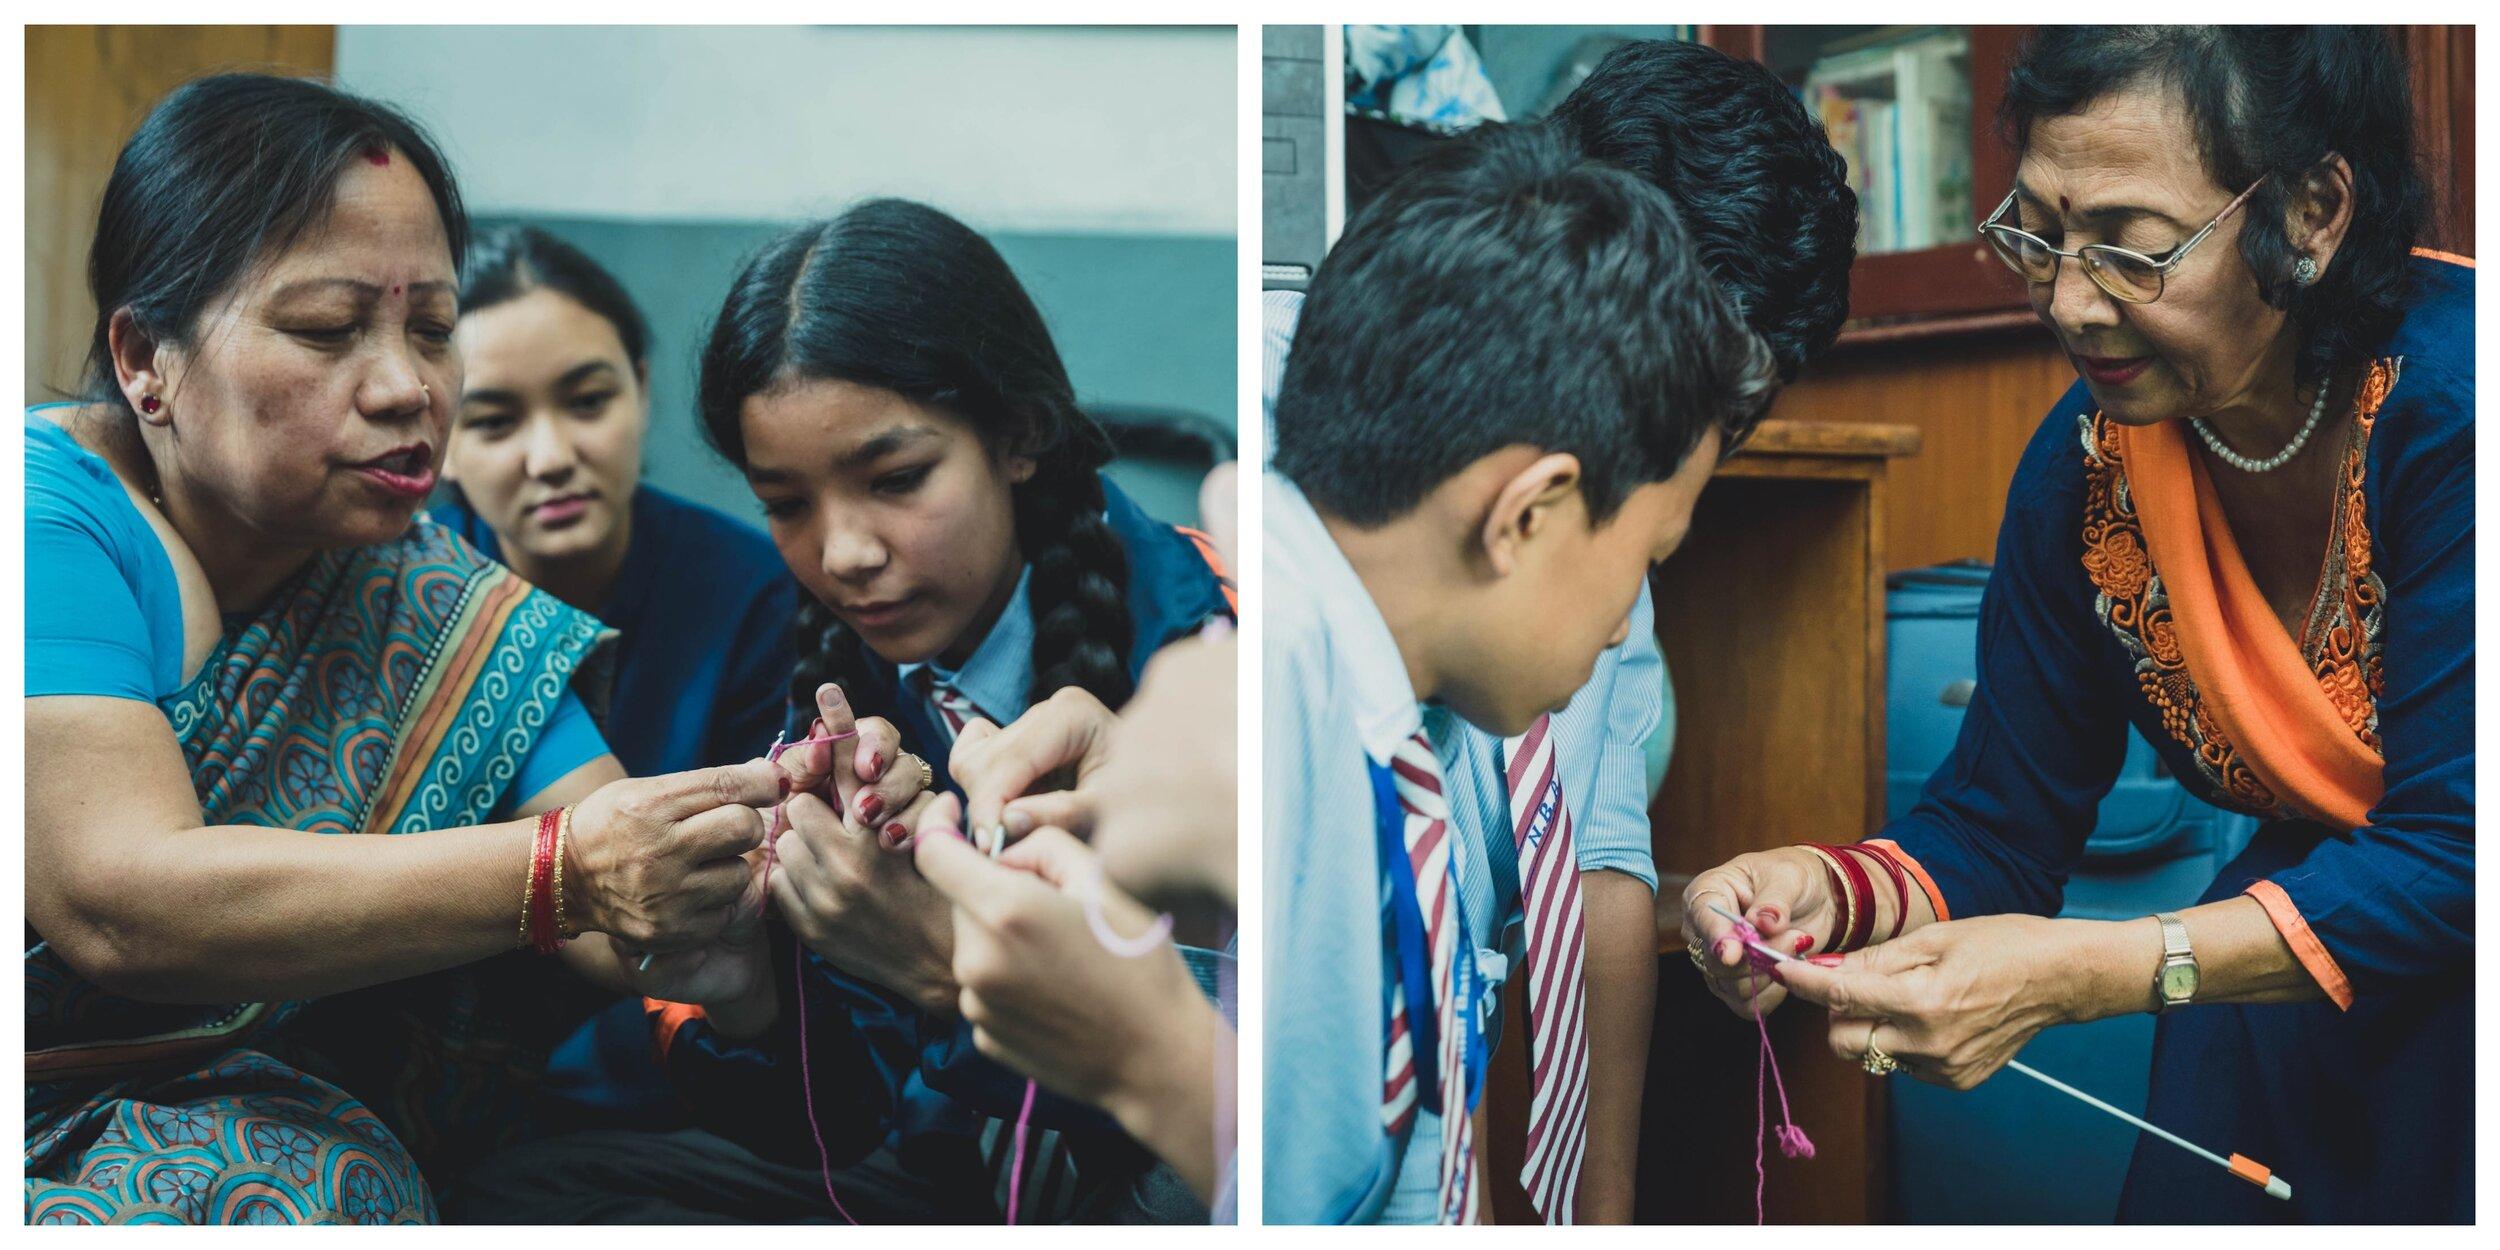 On the left, Aji's Maker Shakuntala Rana, on the right, Aji's Maker Sushila Sthapit teaching young students.